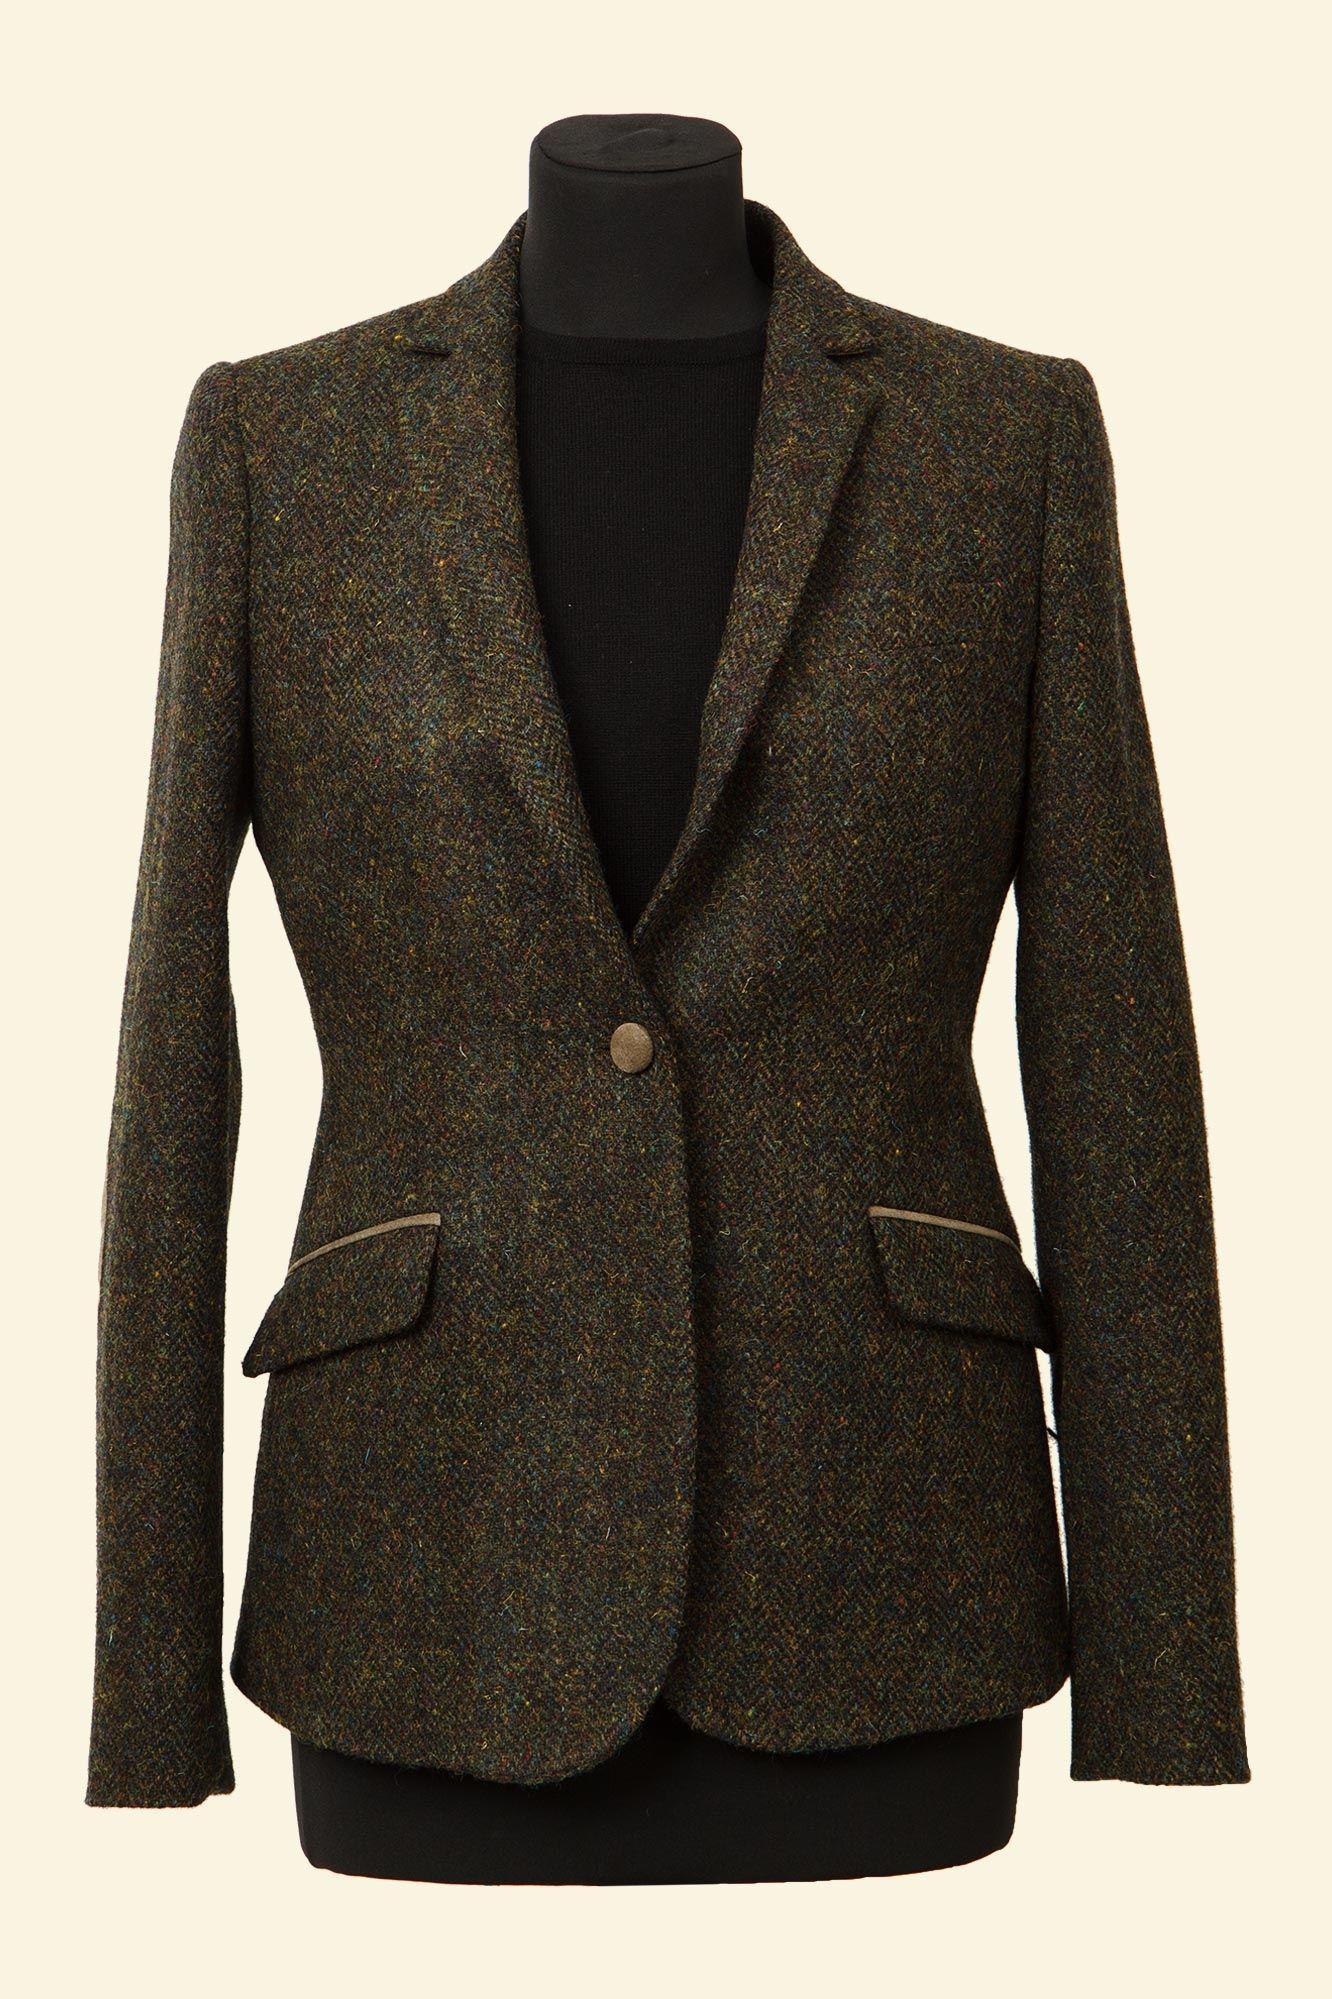 Harris tweed jackets for women